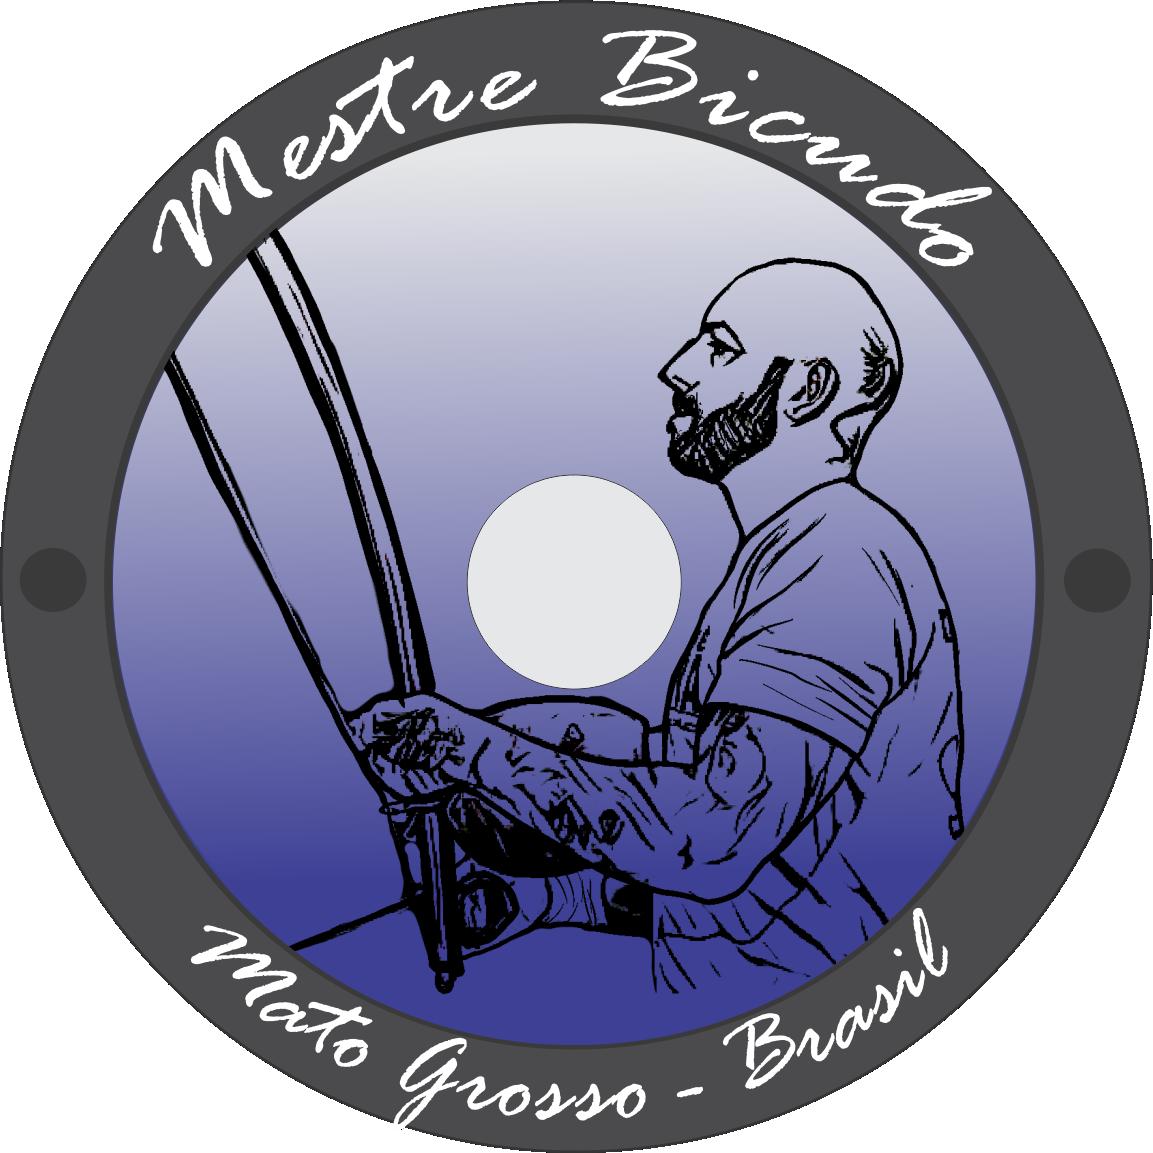 CD MATO GROSSO 2